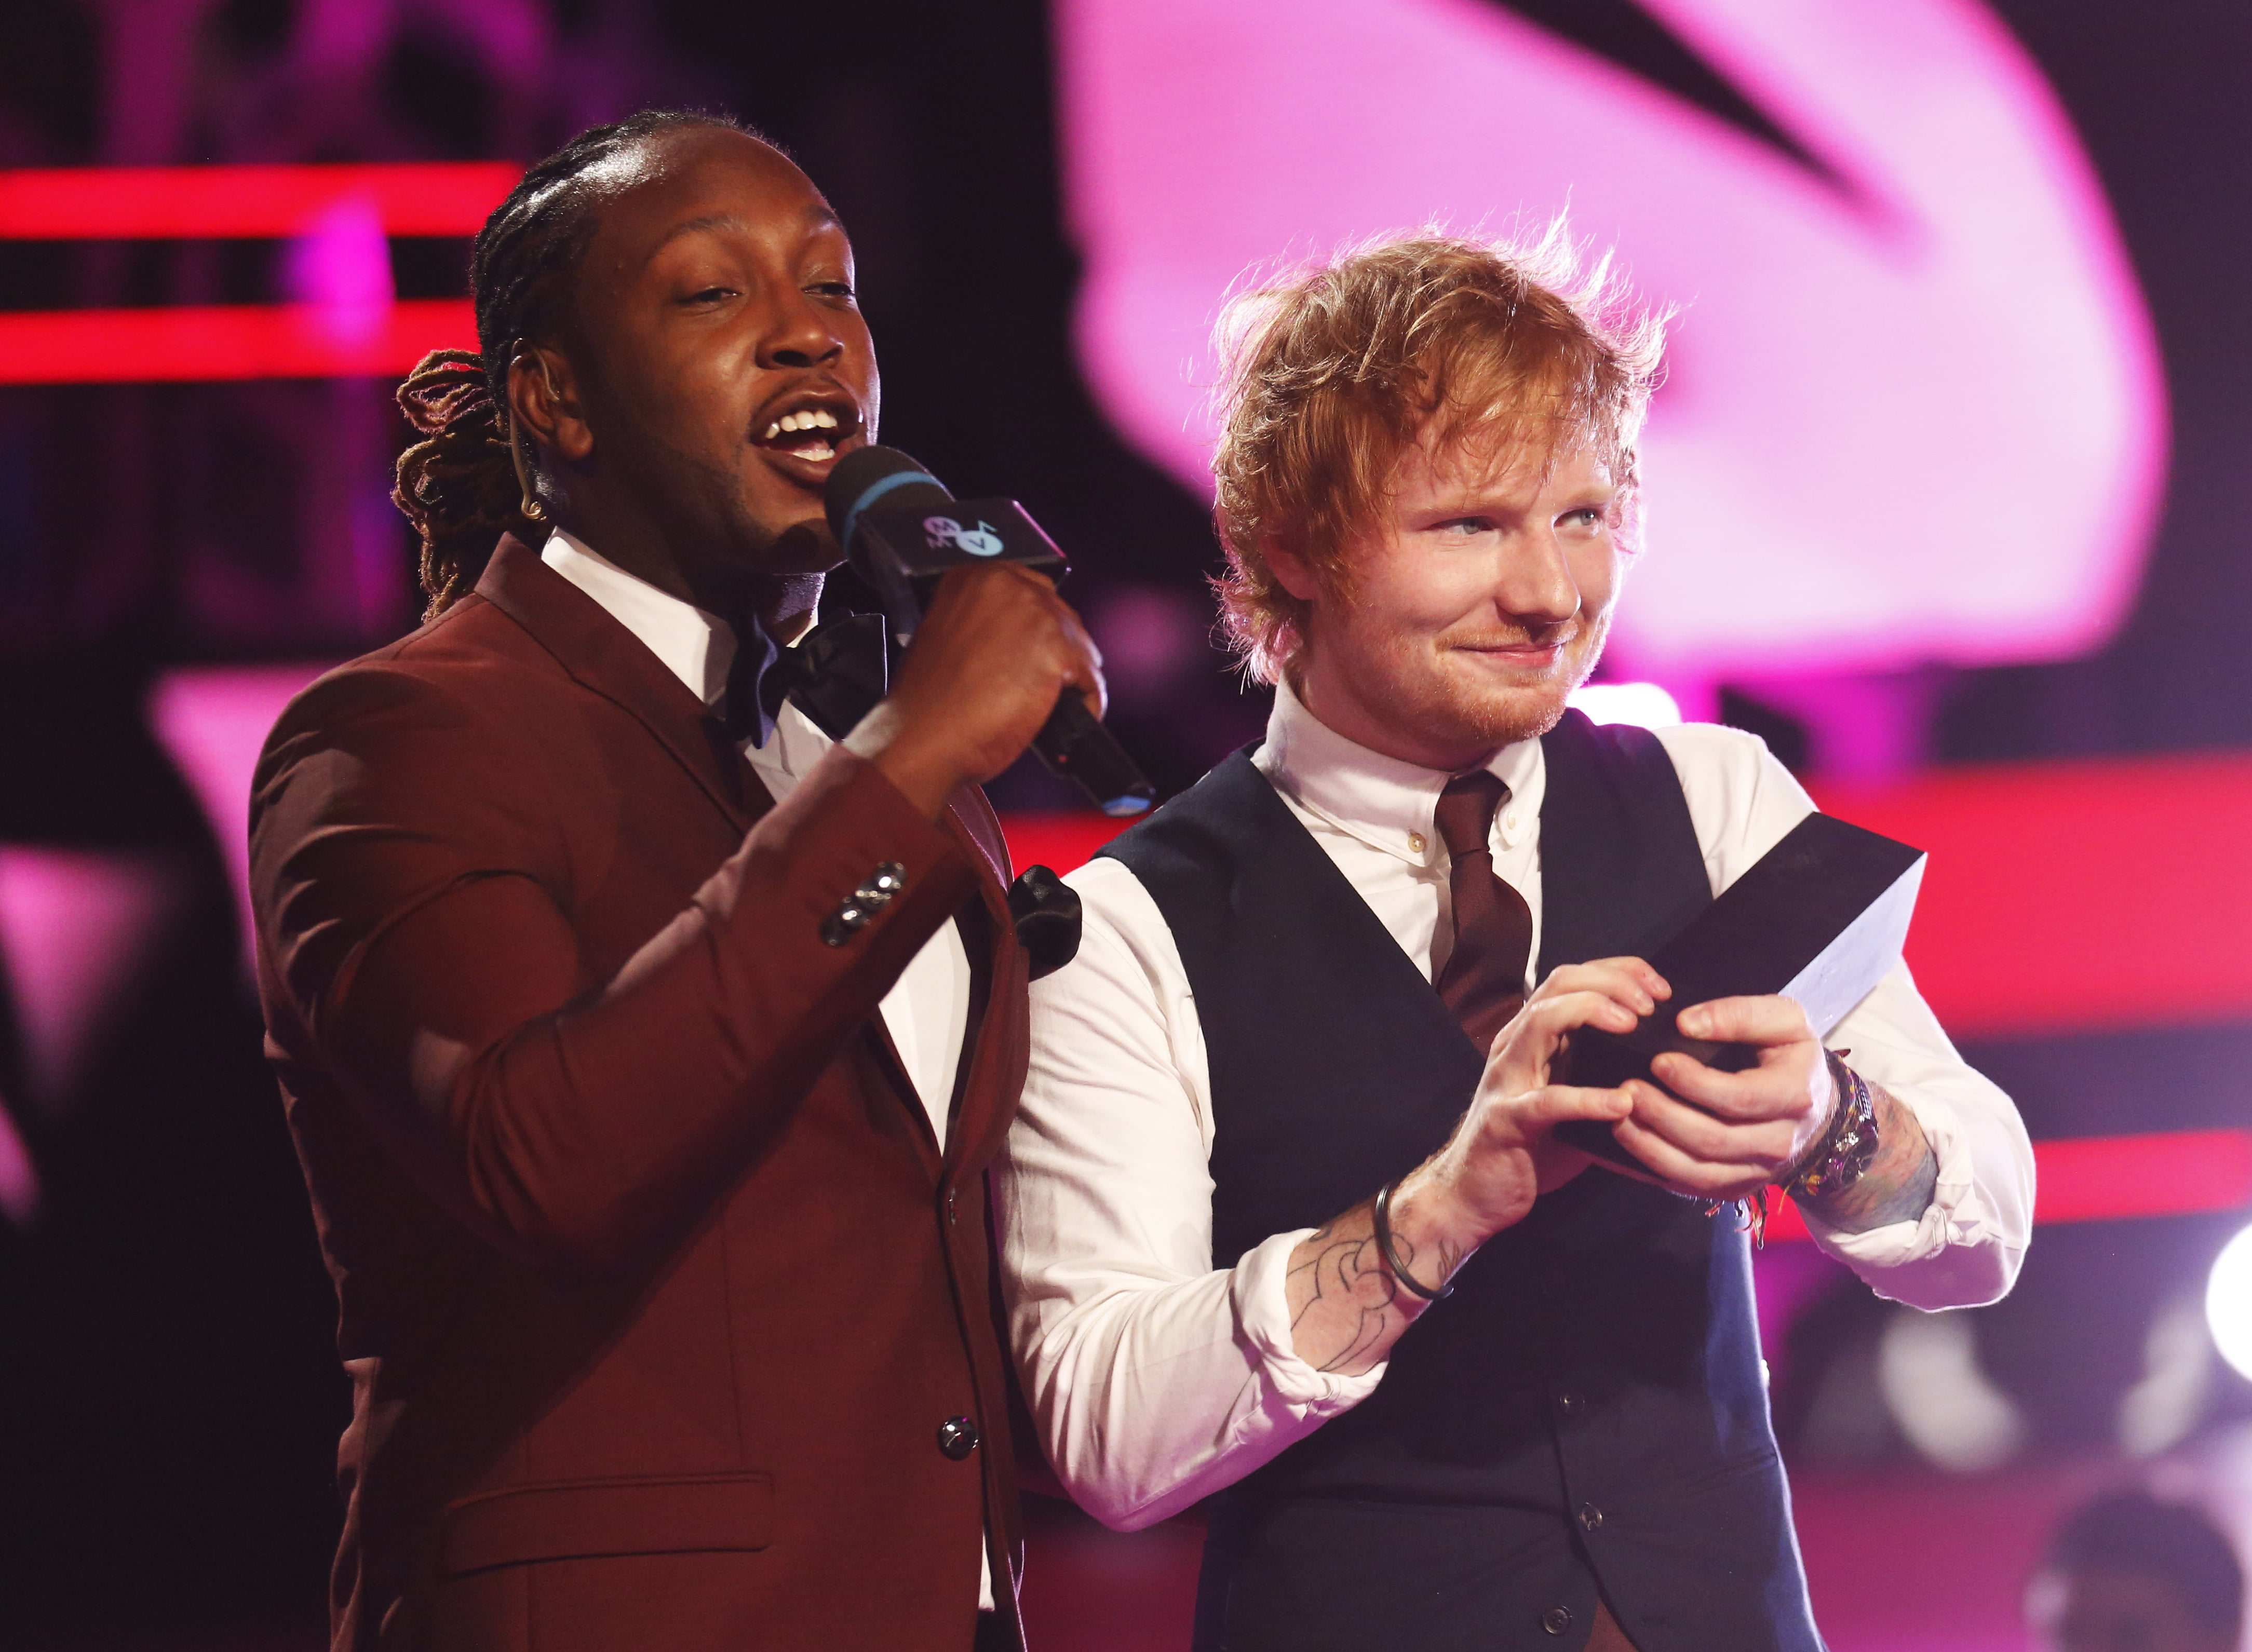 Tyrone Edwards & Ed Sheeran